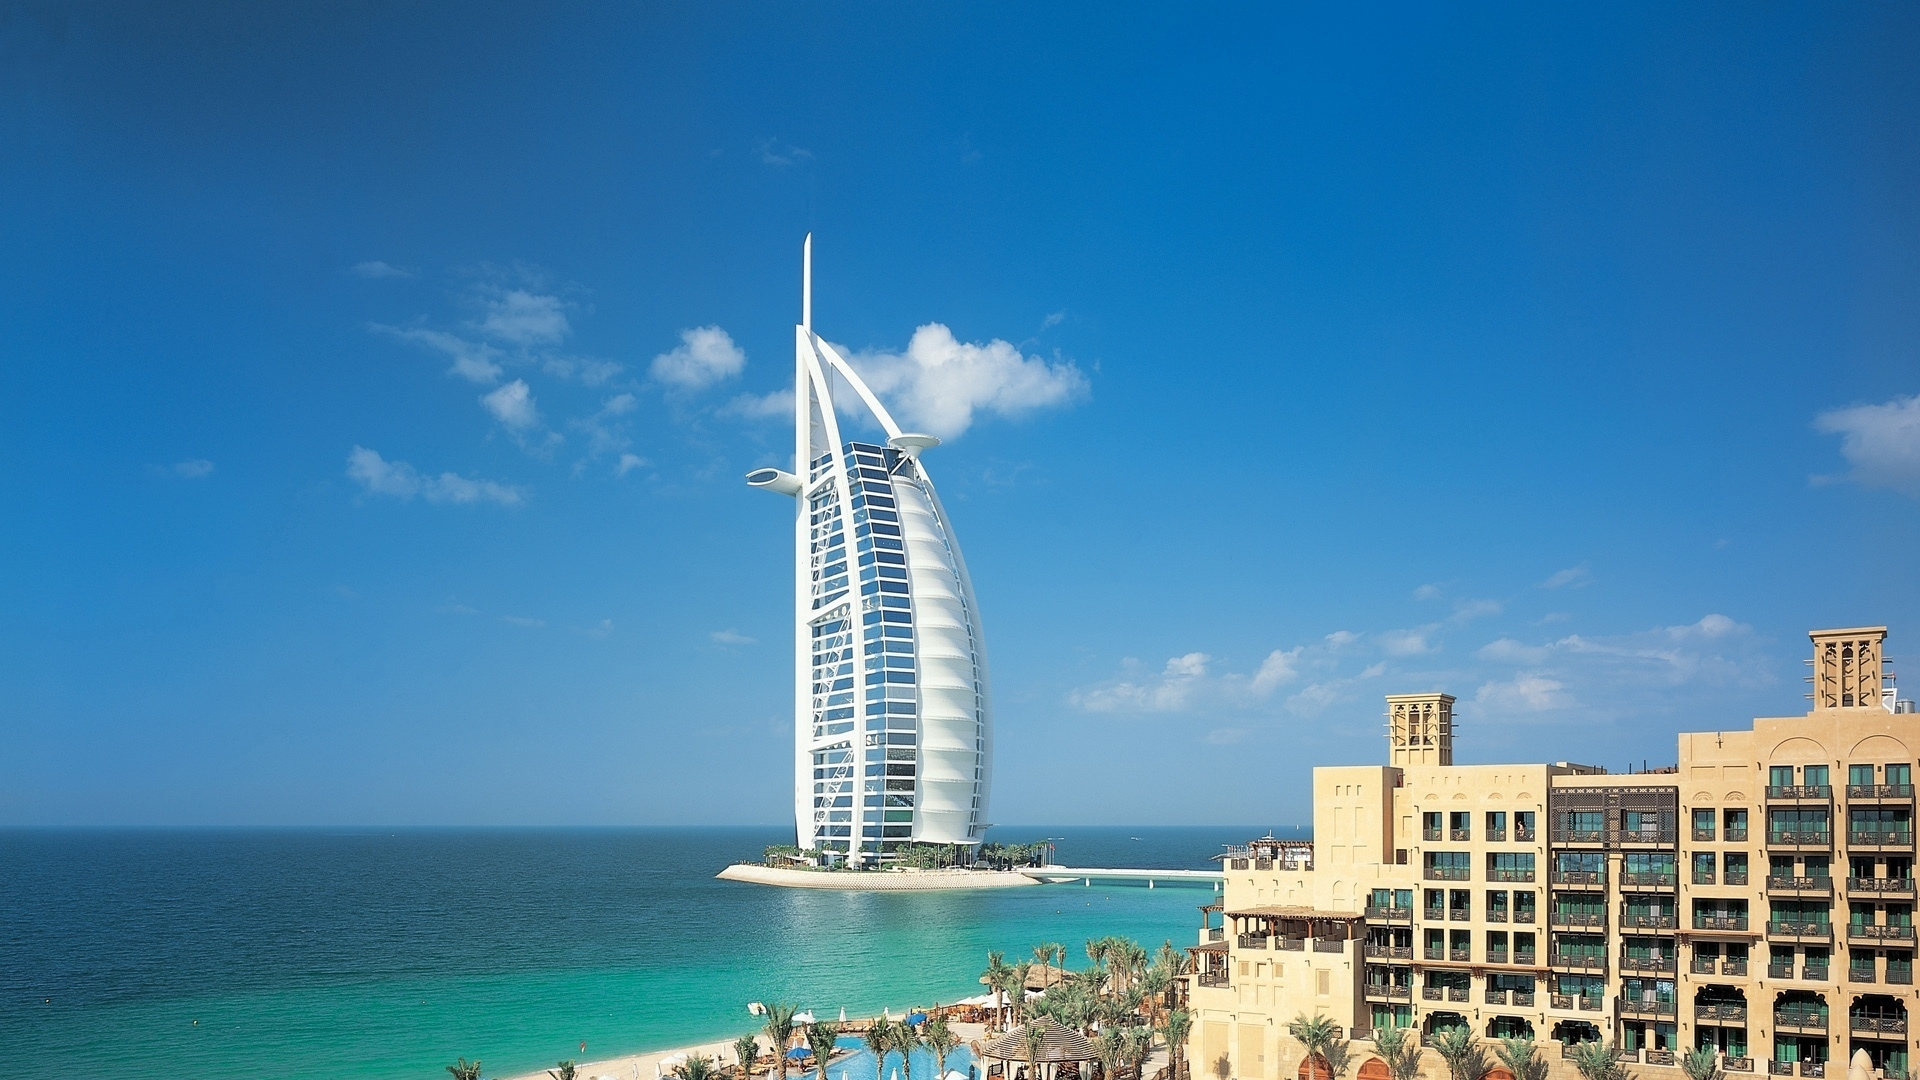 Burj Al Arab Free HD Wallpapers